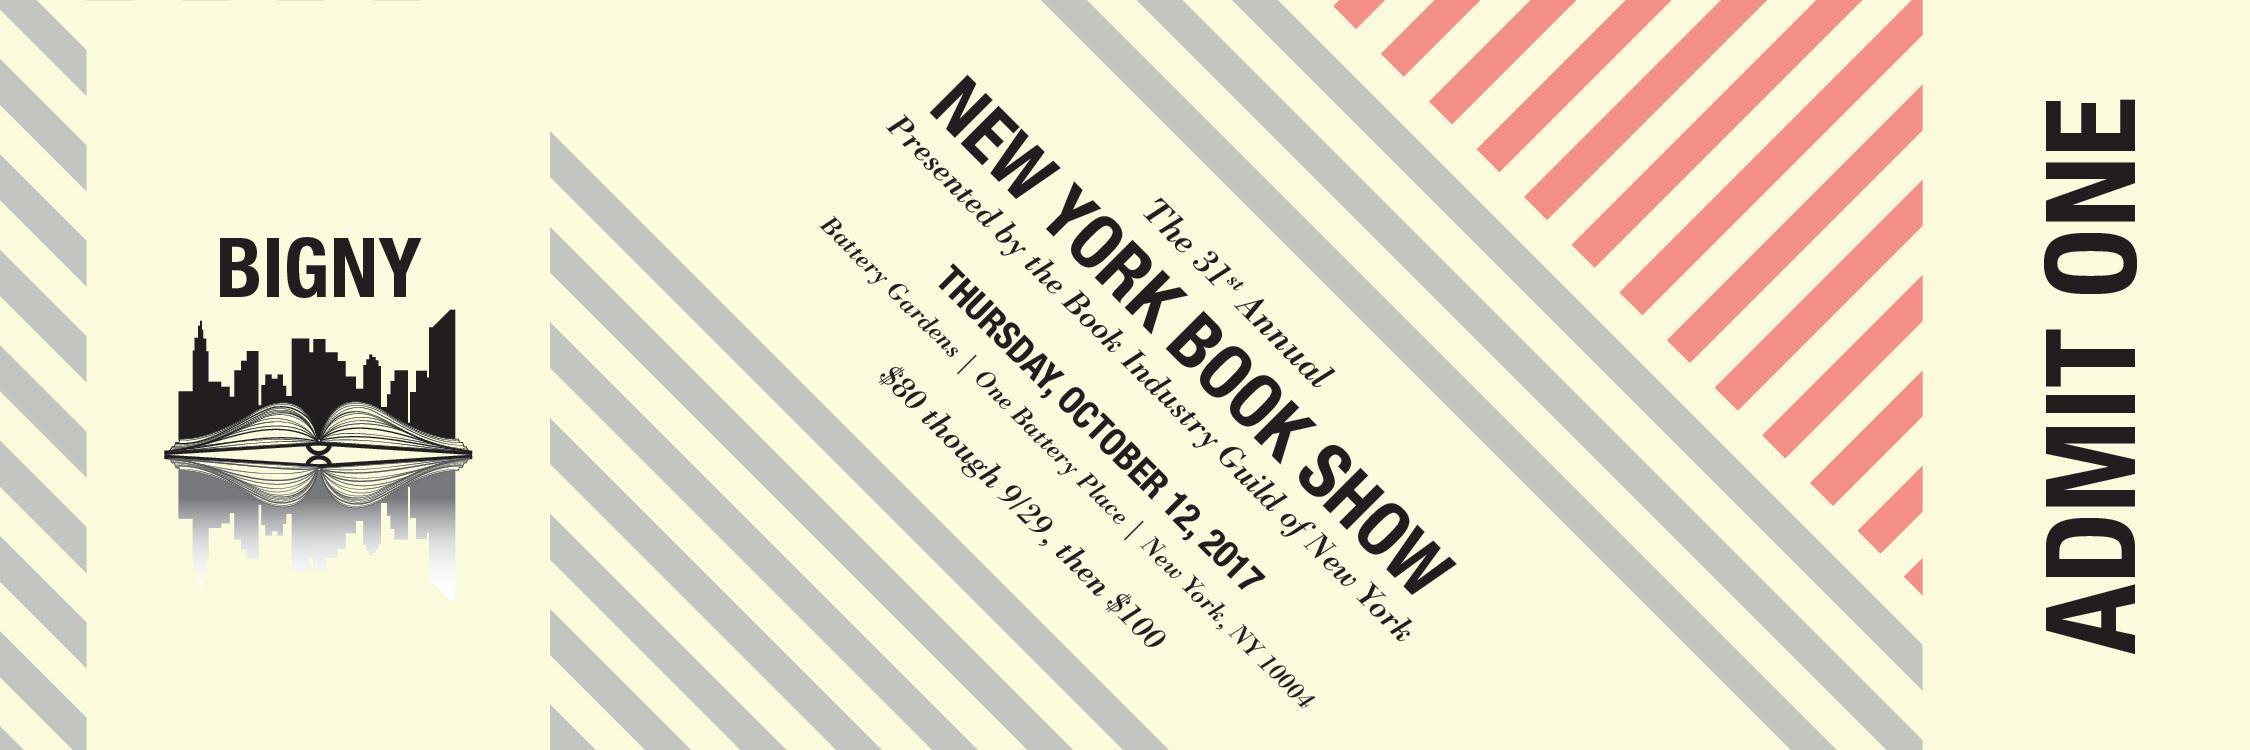 New York Book Show 2017 ticket